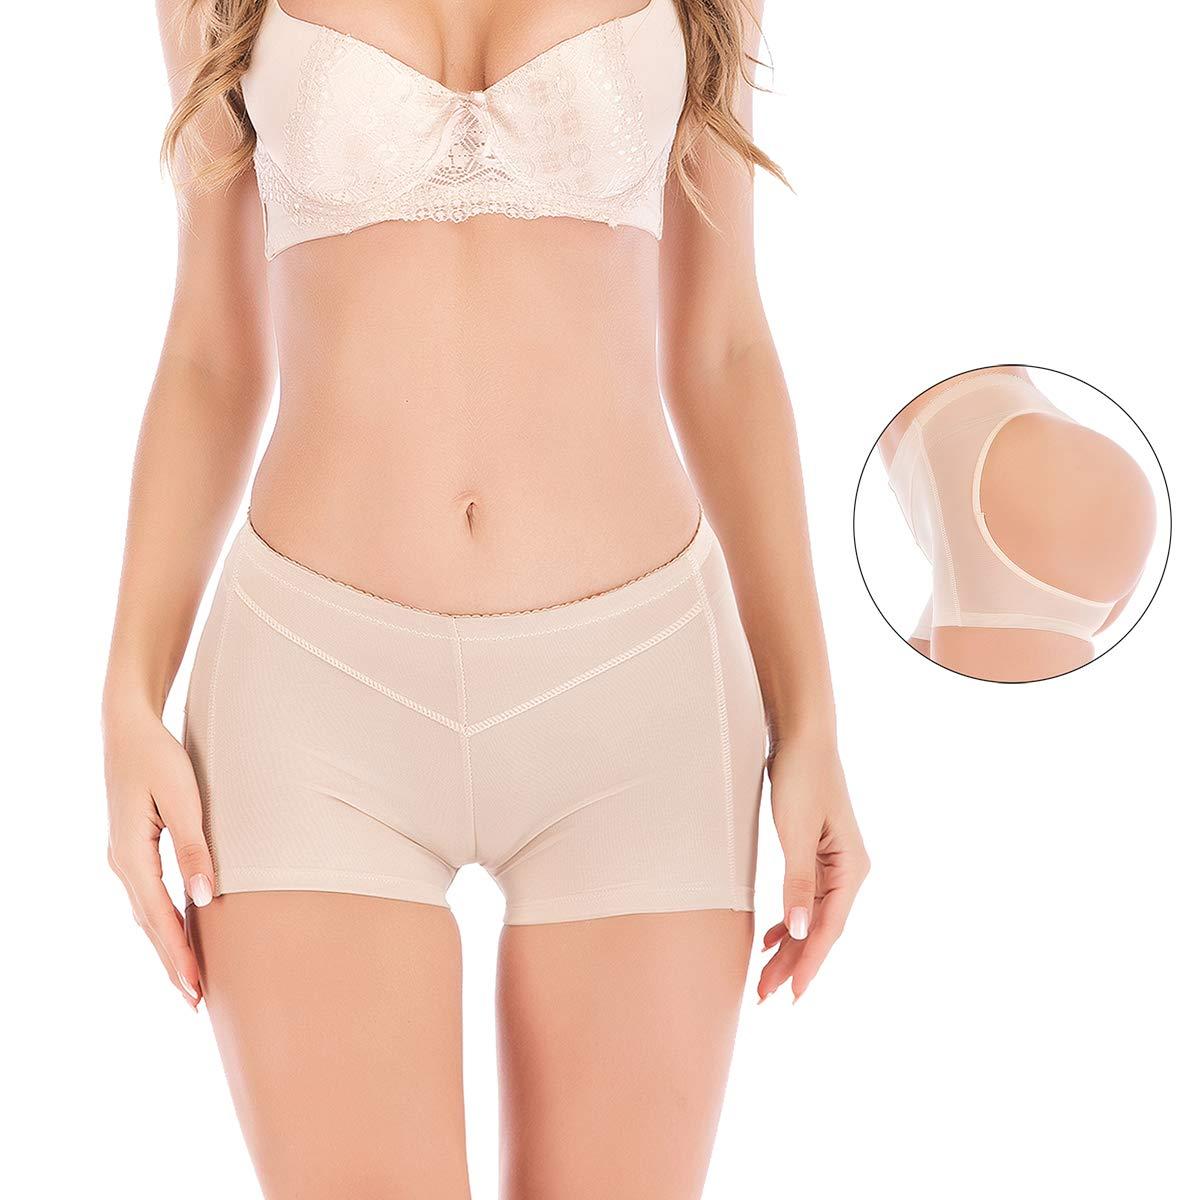 d42babd5b6 SAYFUT Hot Womens Butt Lifter Boy Shorts Shapewear Butt Enhancer Control  Panties at Amazon Women s Clothing store